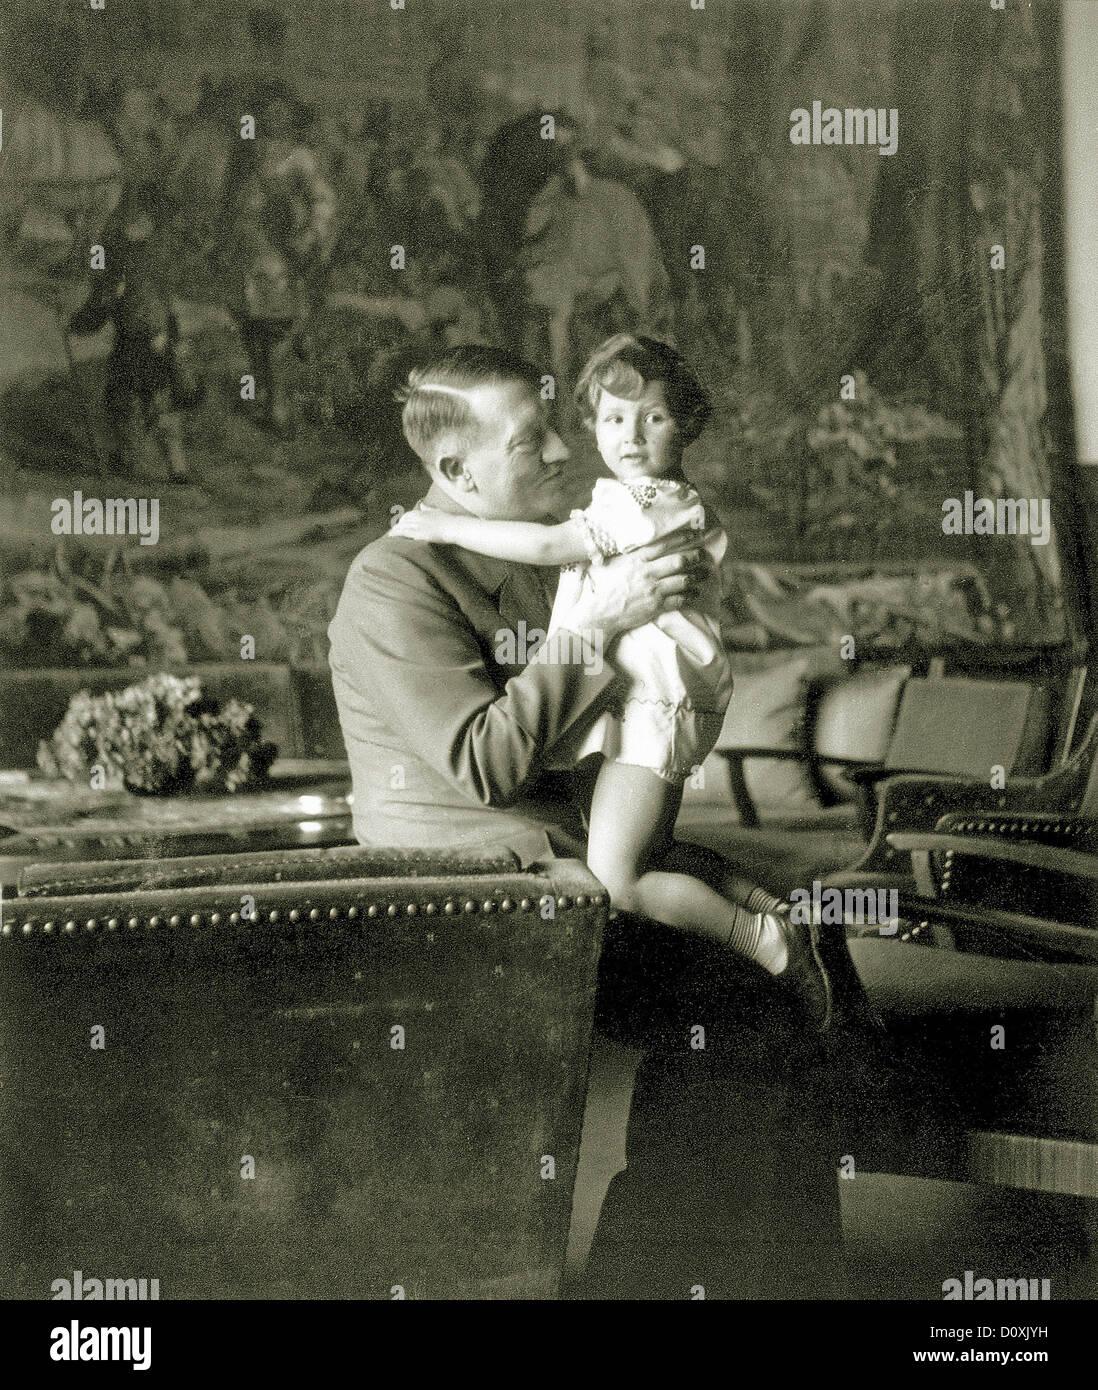 Adolf Hitler, Ursula, Schneider, children, Berghof, Hitler, Berchtesgaden, Germany, 1942, World War II, - Stock Image